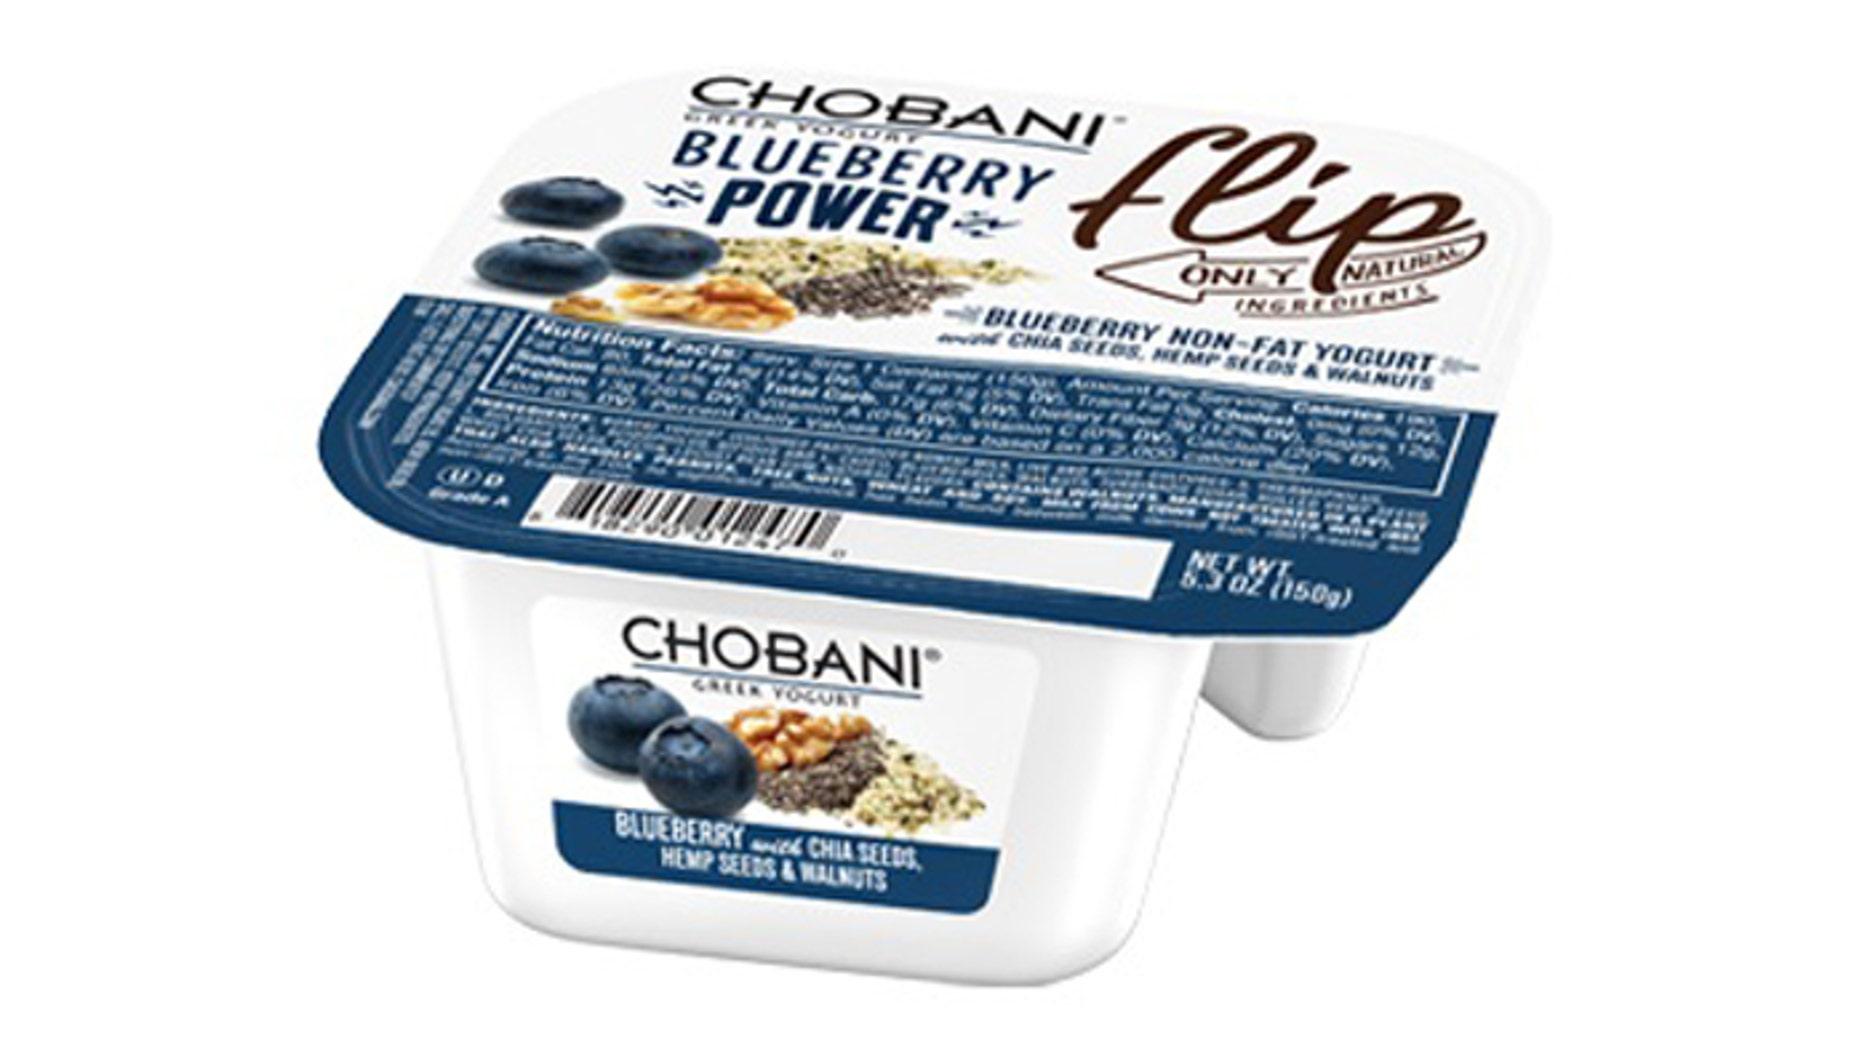 Chobani's Blueberry Power Flip yogurt